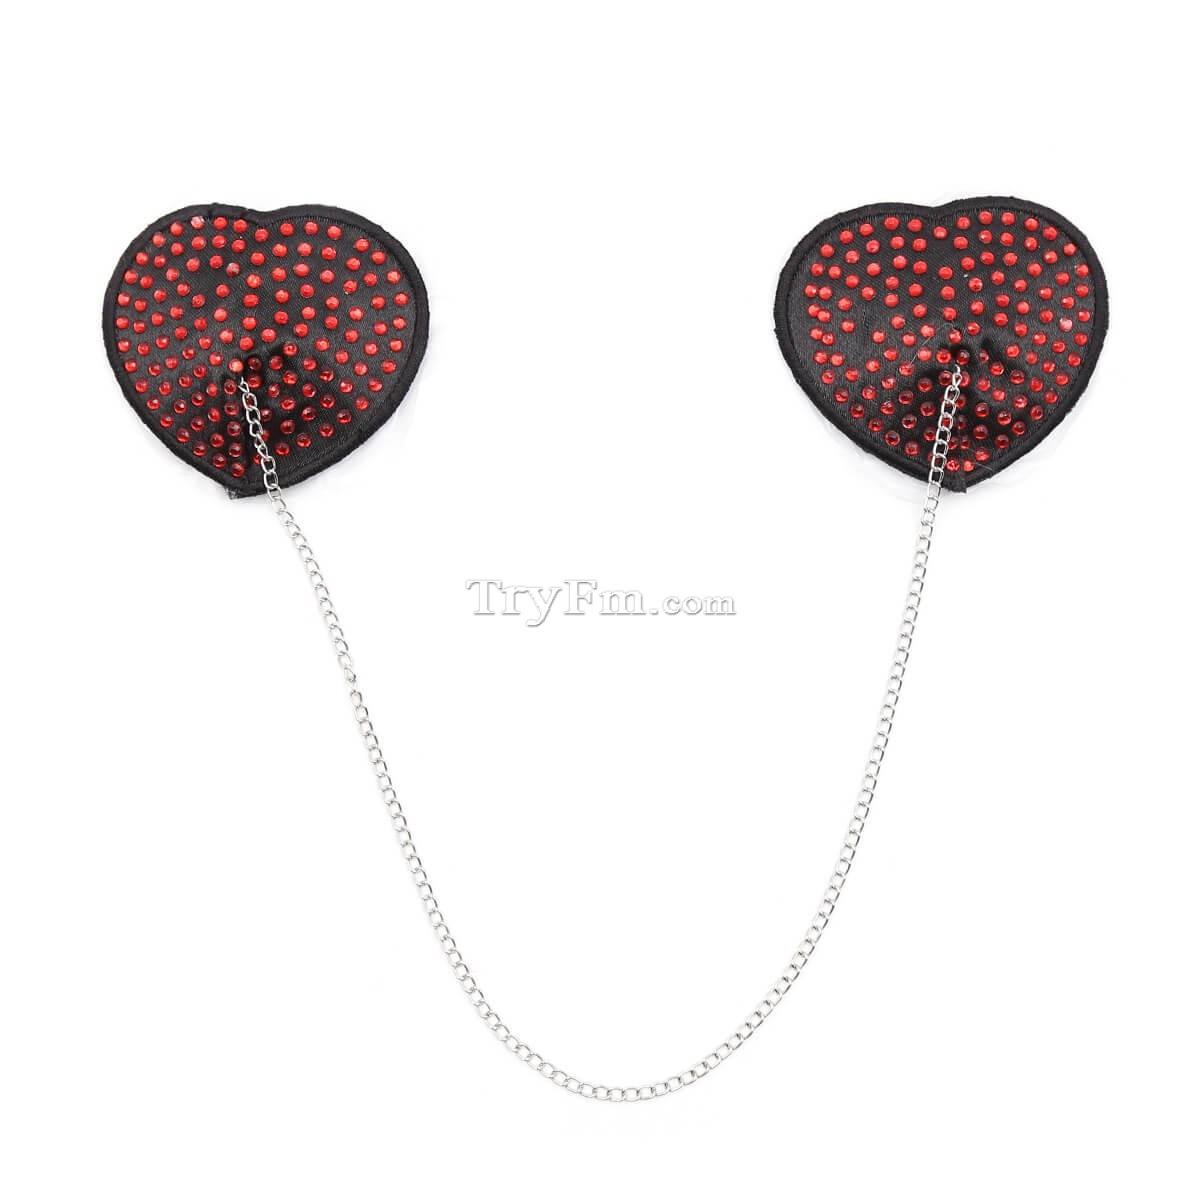 15-Glitter-heart-pasties4.jpg